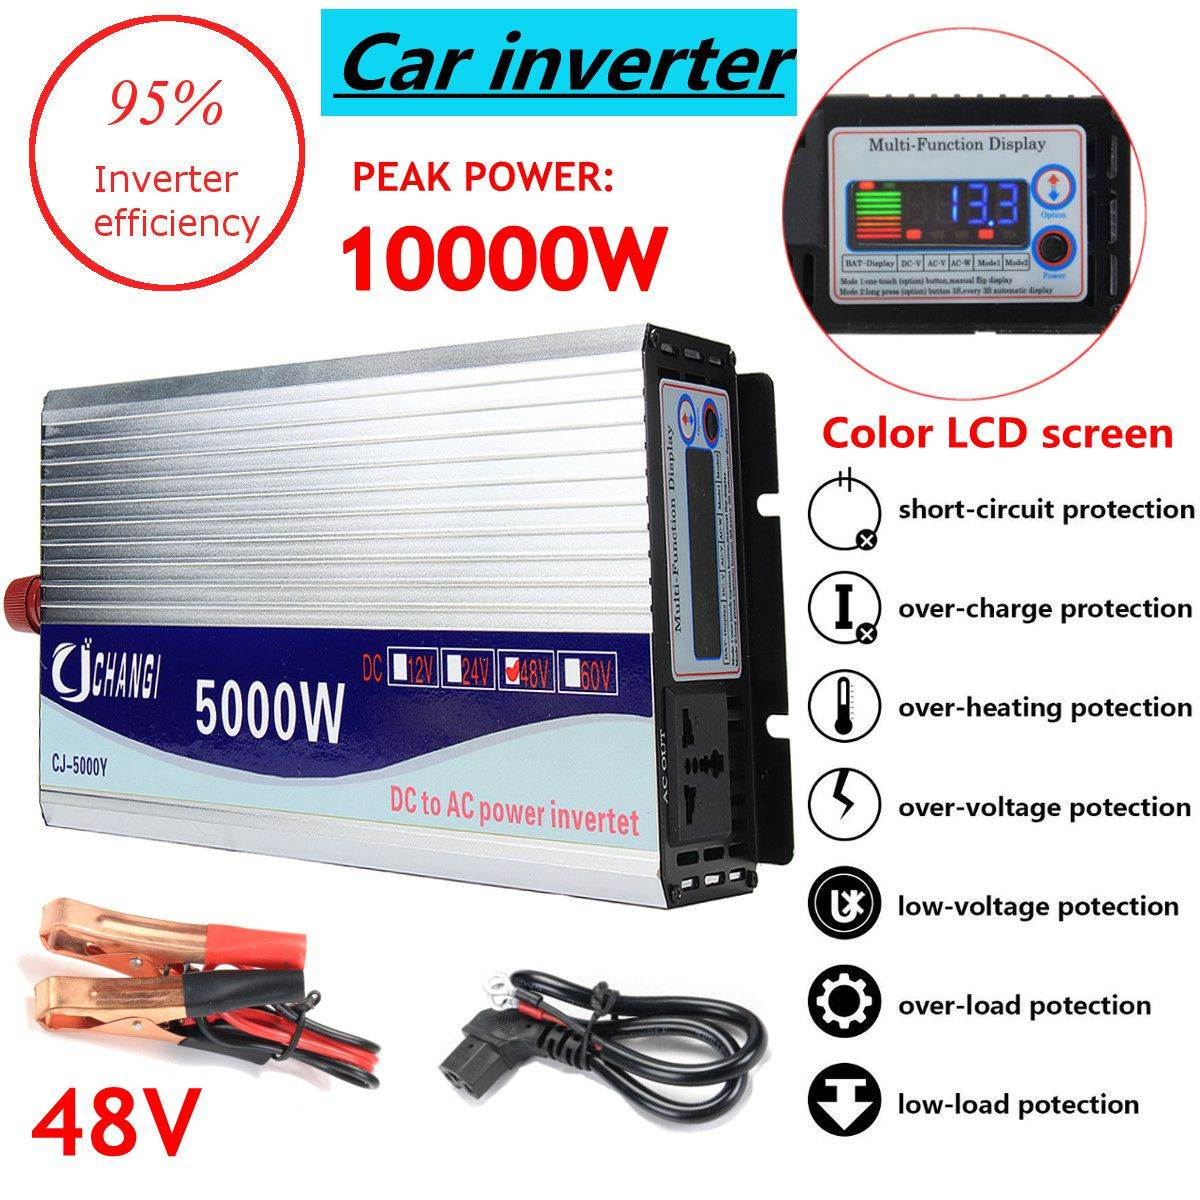 Inverter 12V/24V/48V 220V 5000W 10000W Peak Modified Sine Wave Power Voltage transformer Inverter Converter + LCD display